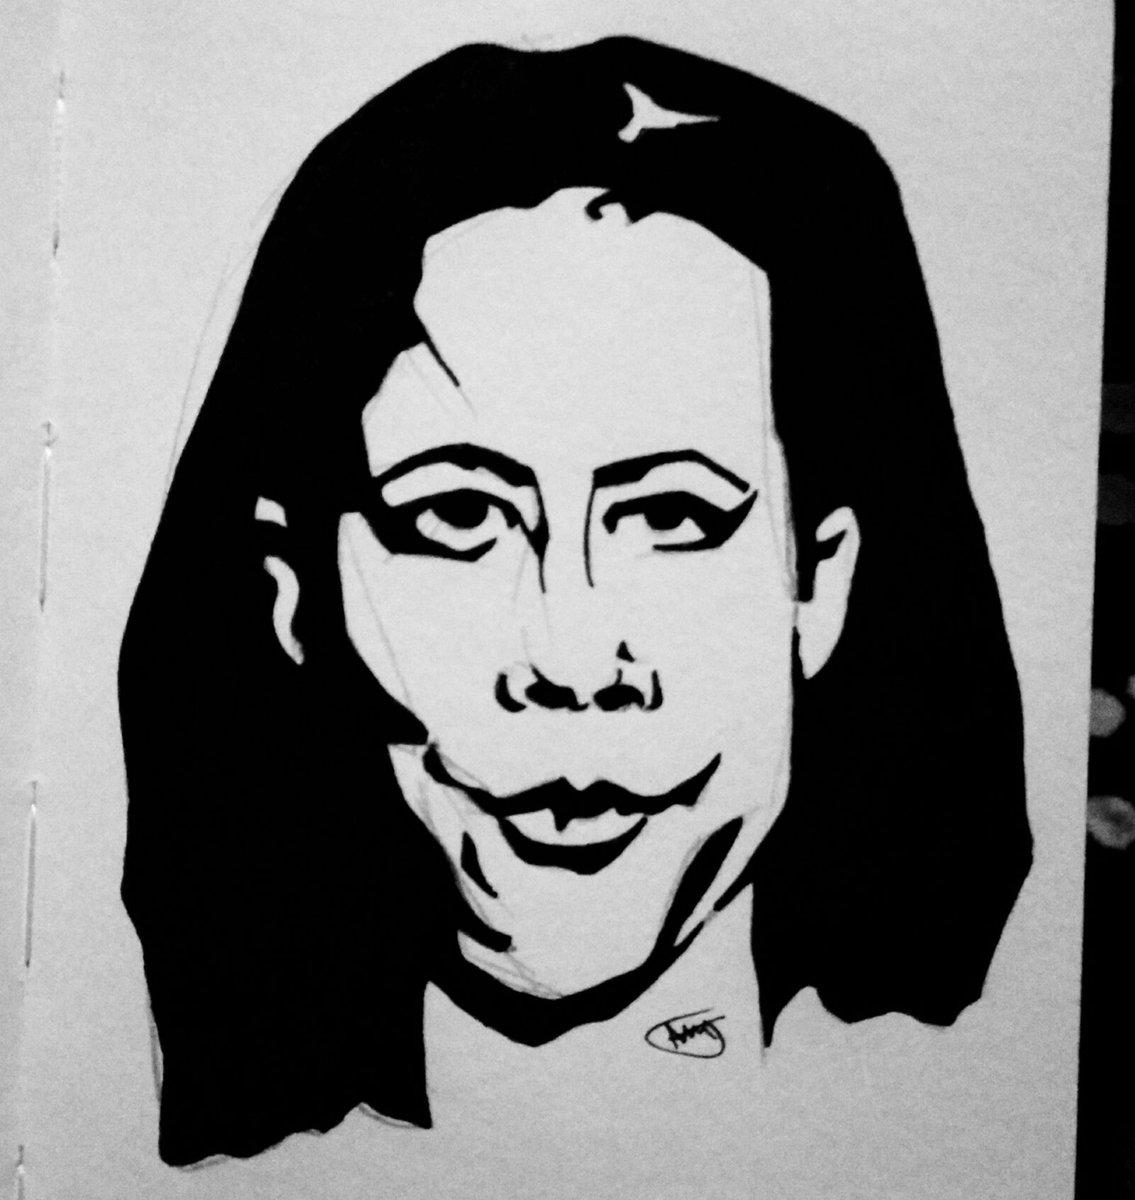 Oitnbseason6 orangeisthenewblack netflix actress actor mendoza gloriamendoza selenisleyva portrait illustration artwork drawing sketch